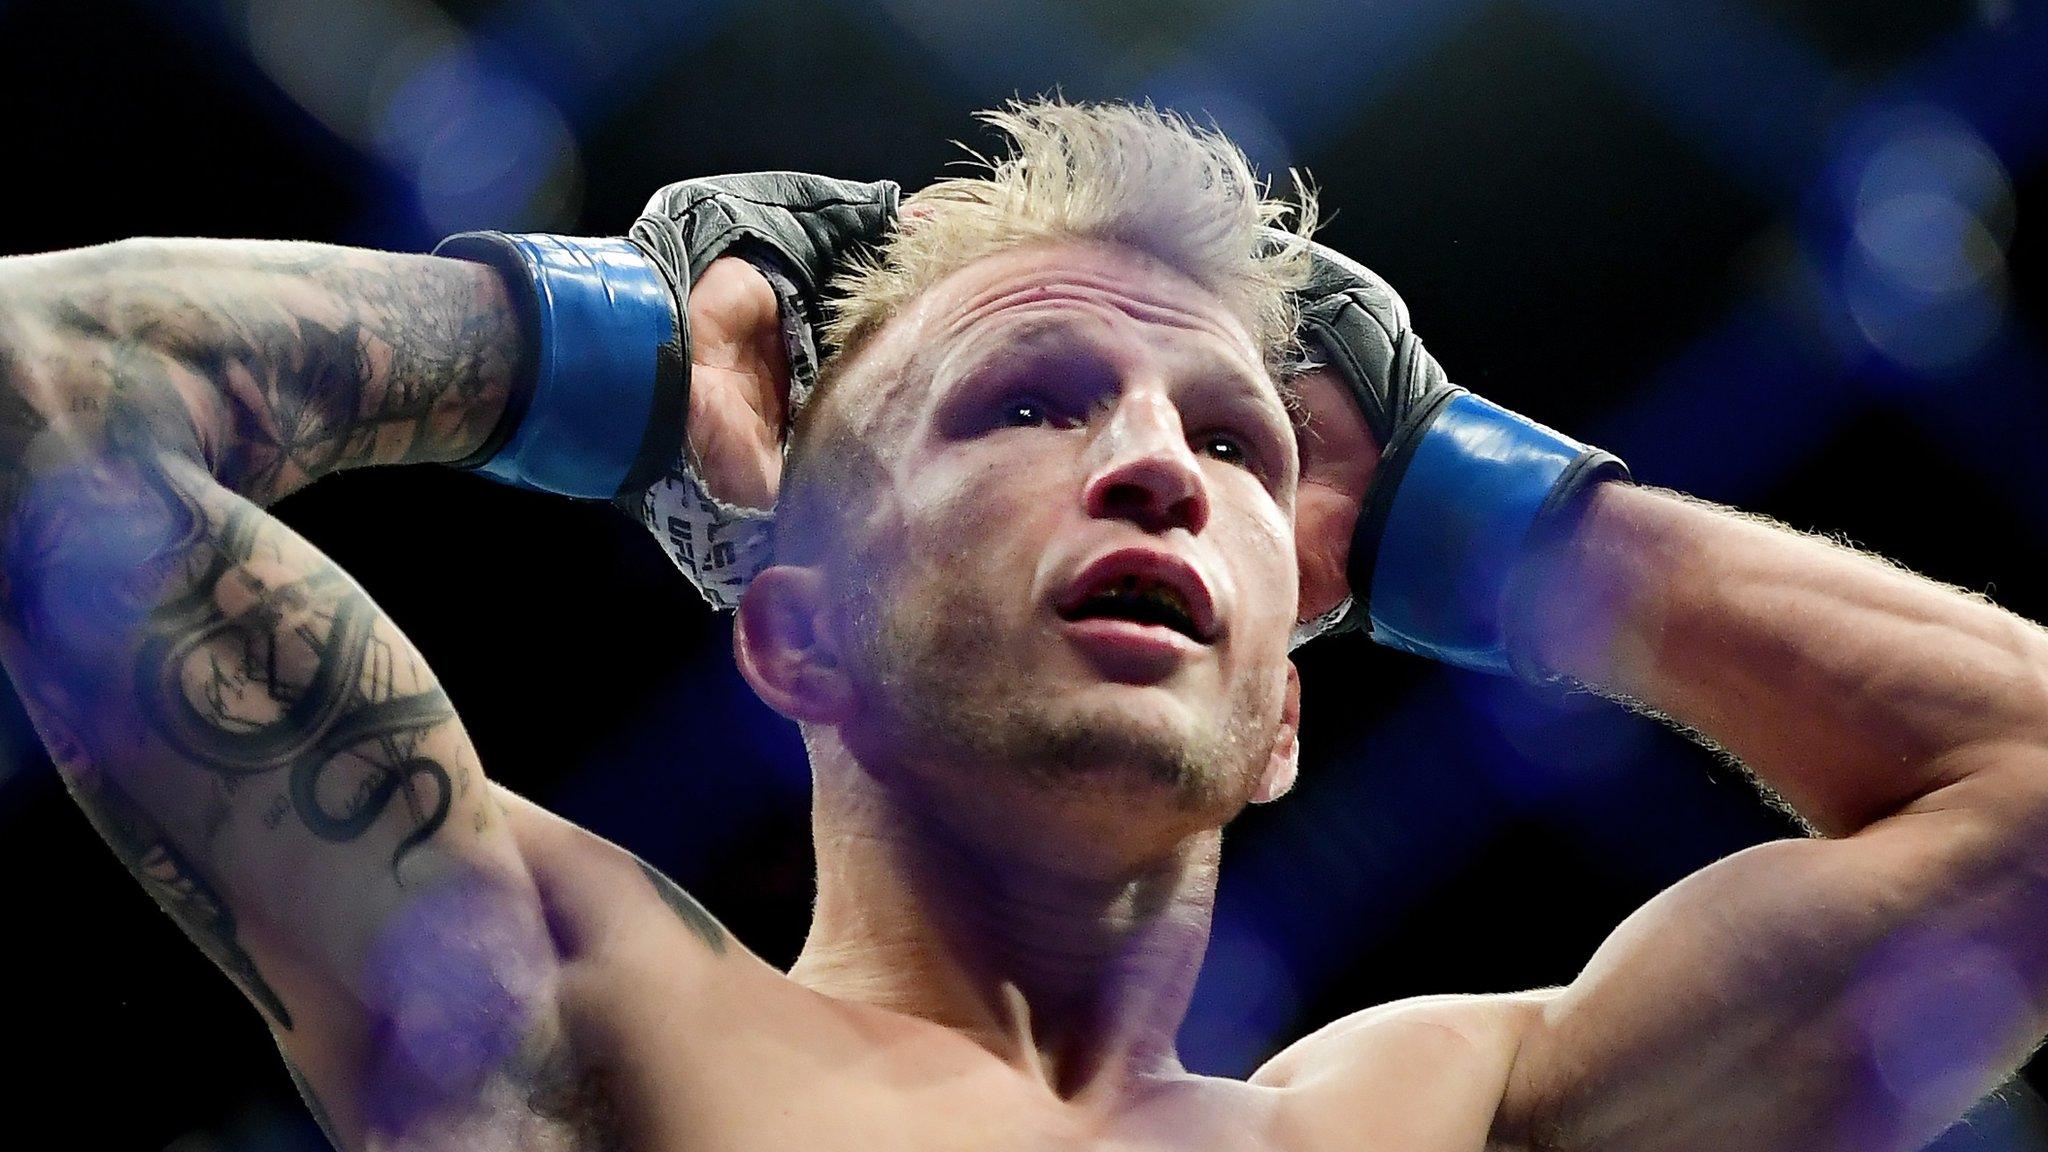 TJ Dillashaw vacates UFC title after failing drug test